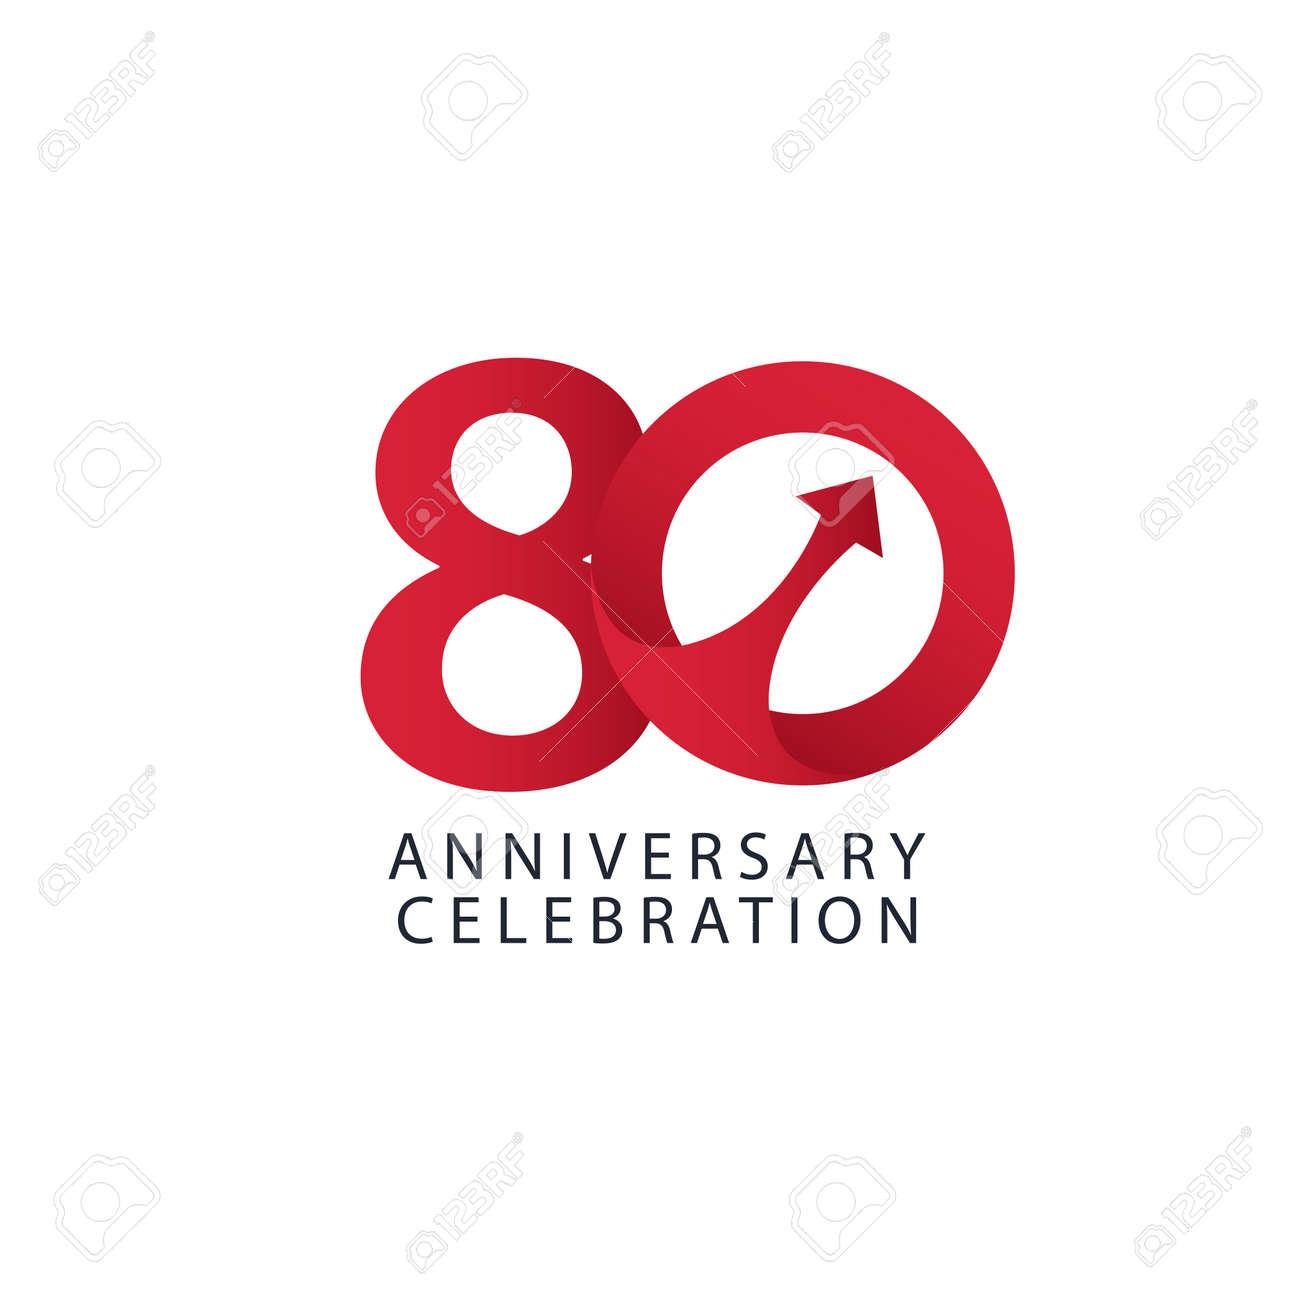 80 Years Anniversary Celebration Vector Template Design Illustration - 163698094